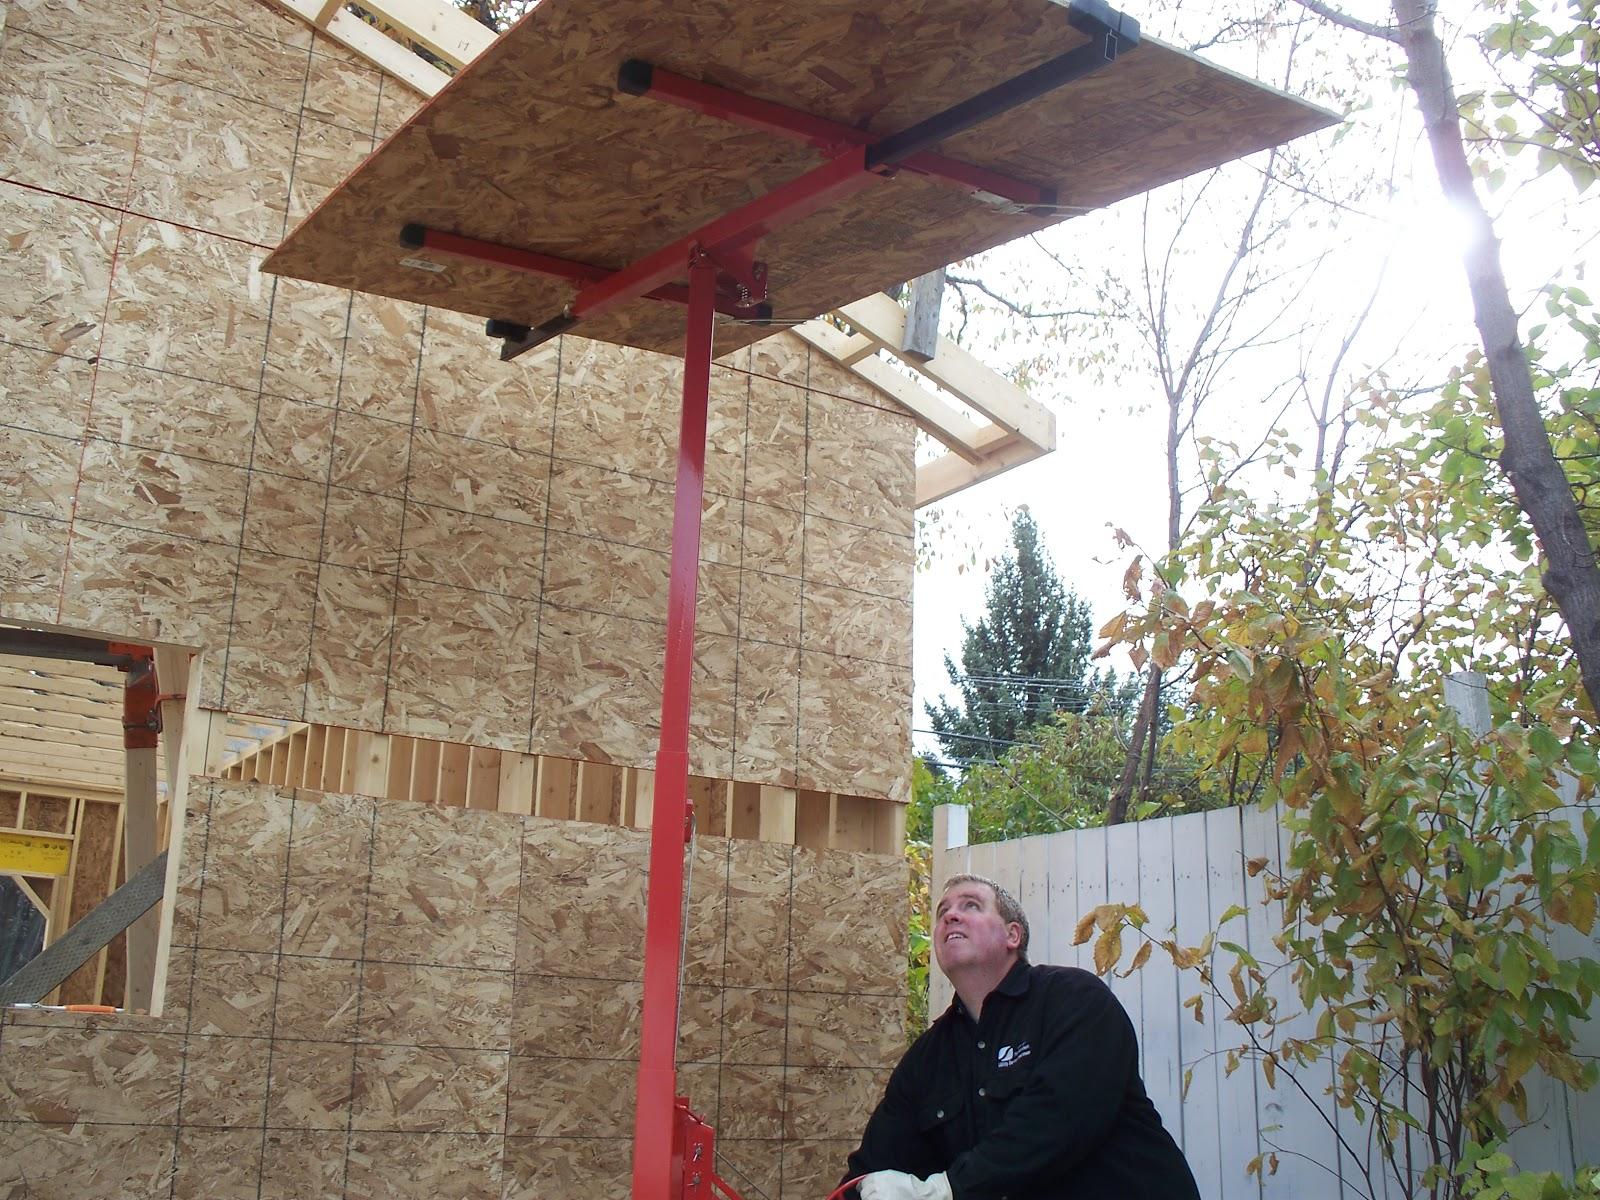 http://1.bp.blogspot.com/-YDZ7o5nqHTE/UHY5JqAZvoI/AAAAAAAAApQ/T3EkdncTPH4/s1600/Dry+wall+lift+3.JPG